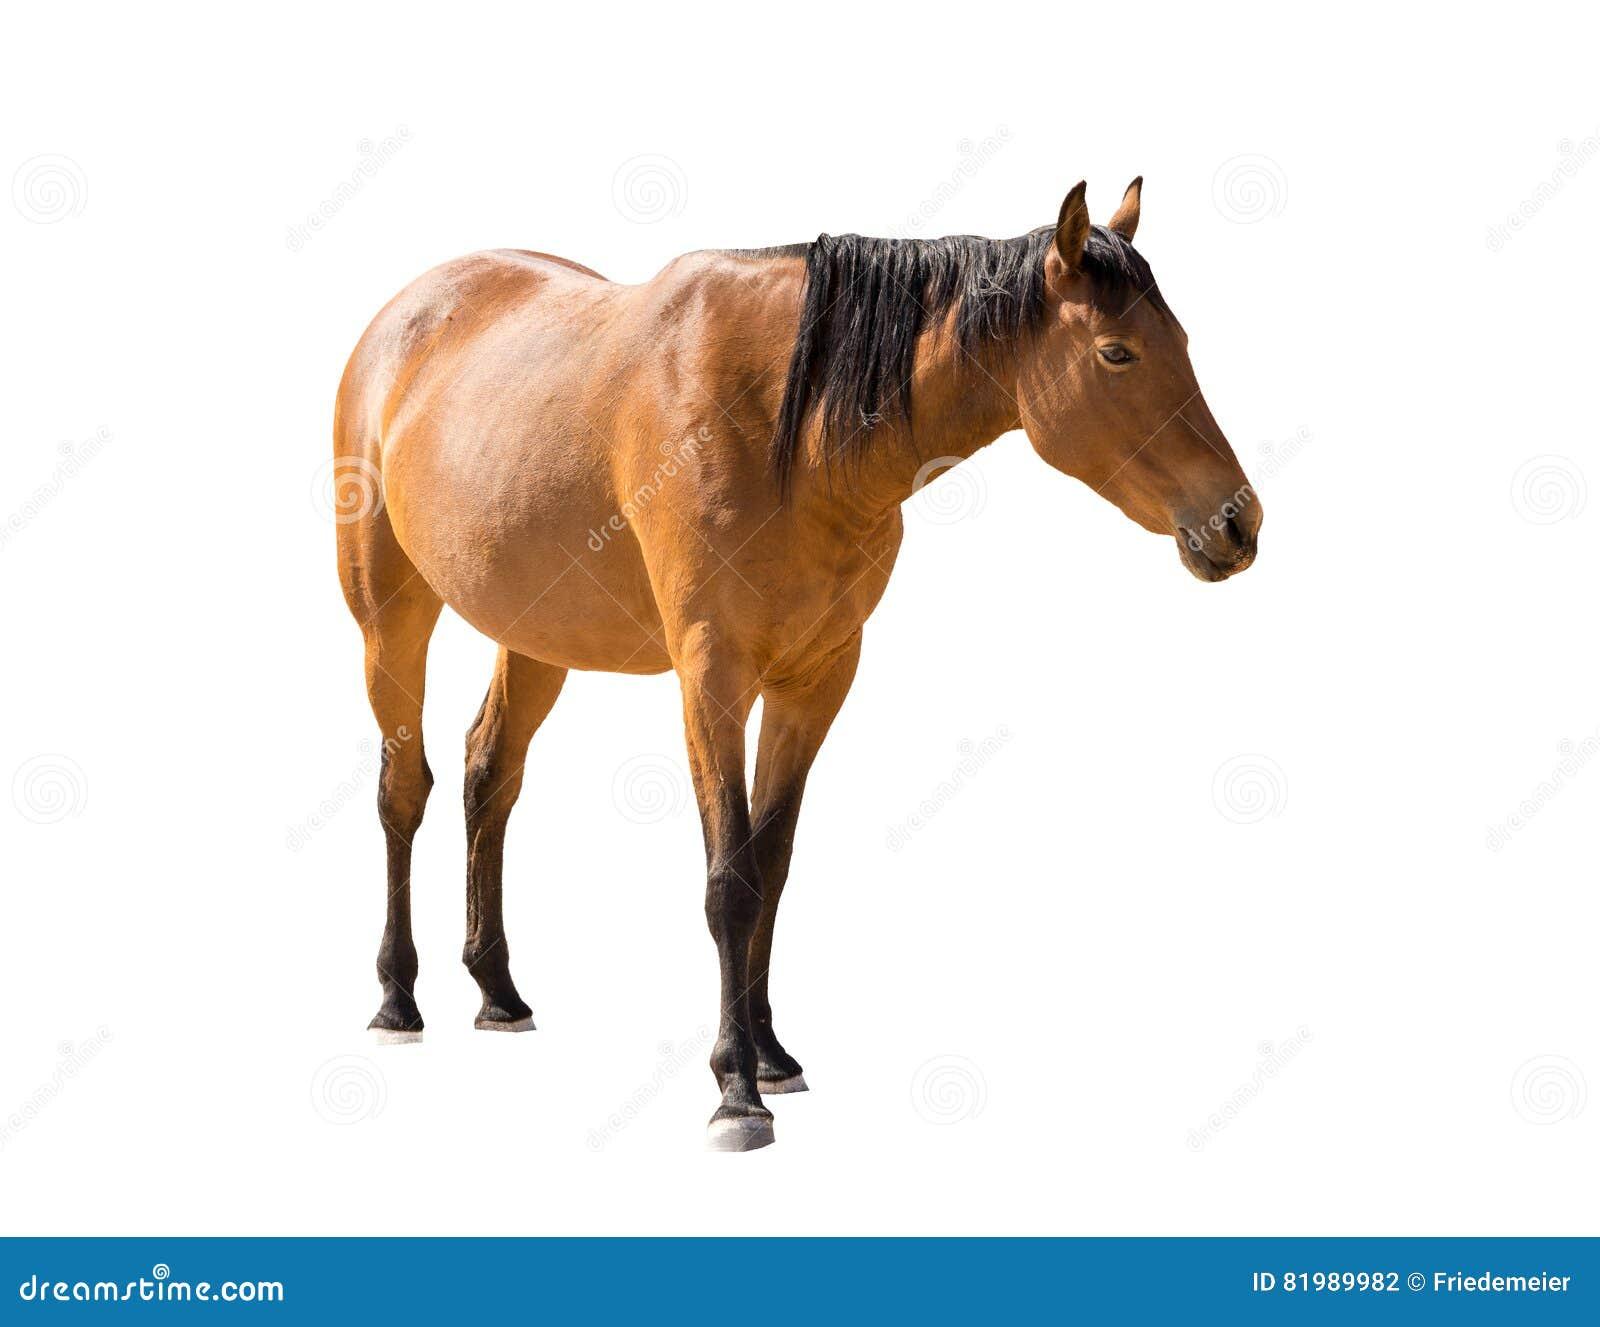 namibian wild horse from garub desert isolated on white background